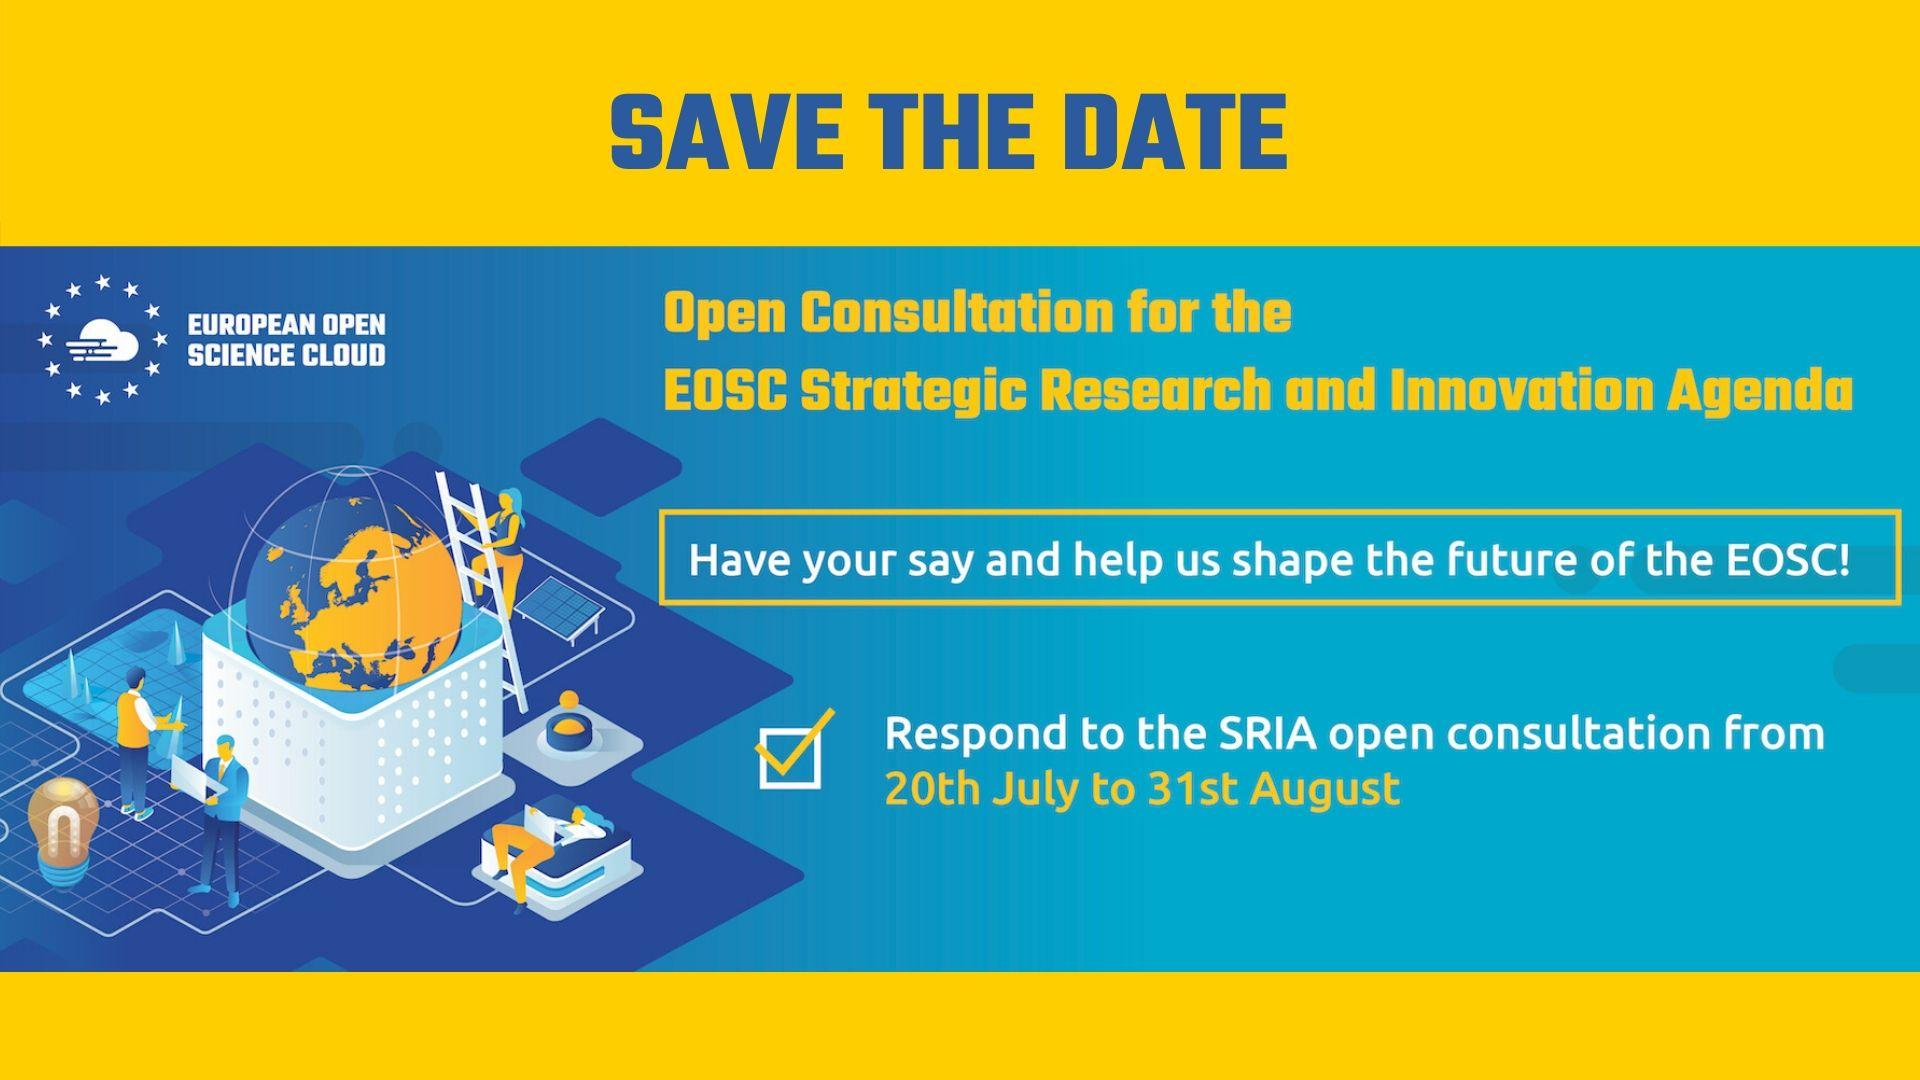 Strategic Research and Innovation Agenda (SRIA)